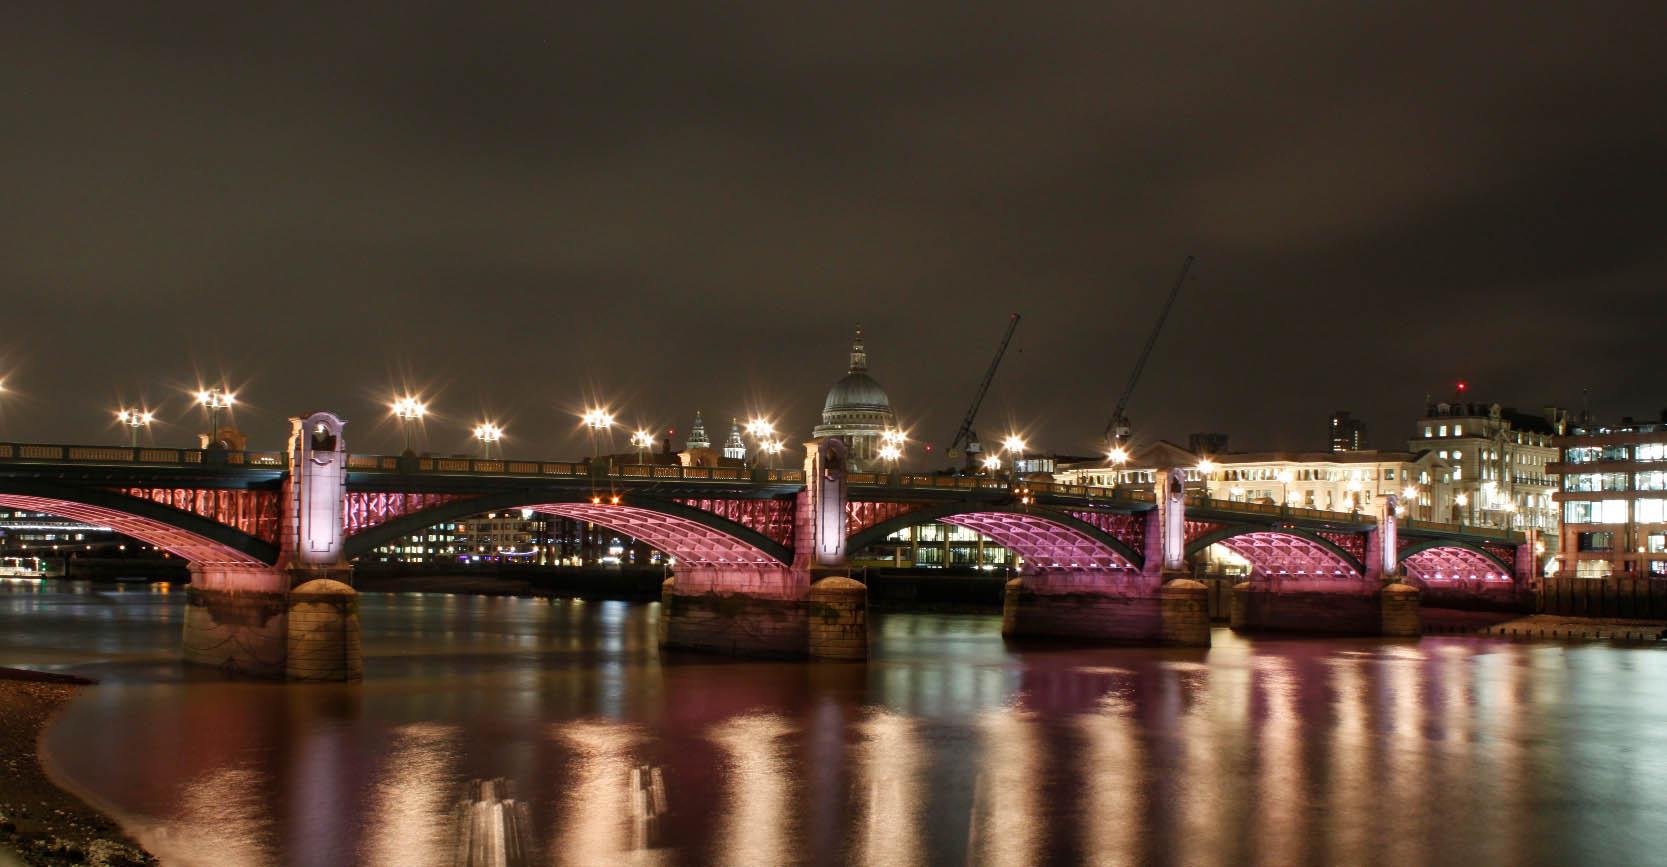 LondonBridge